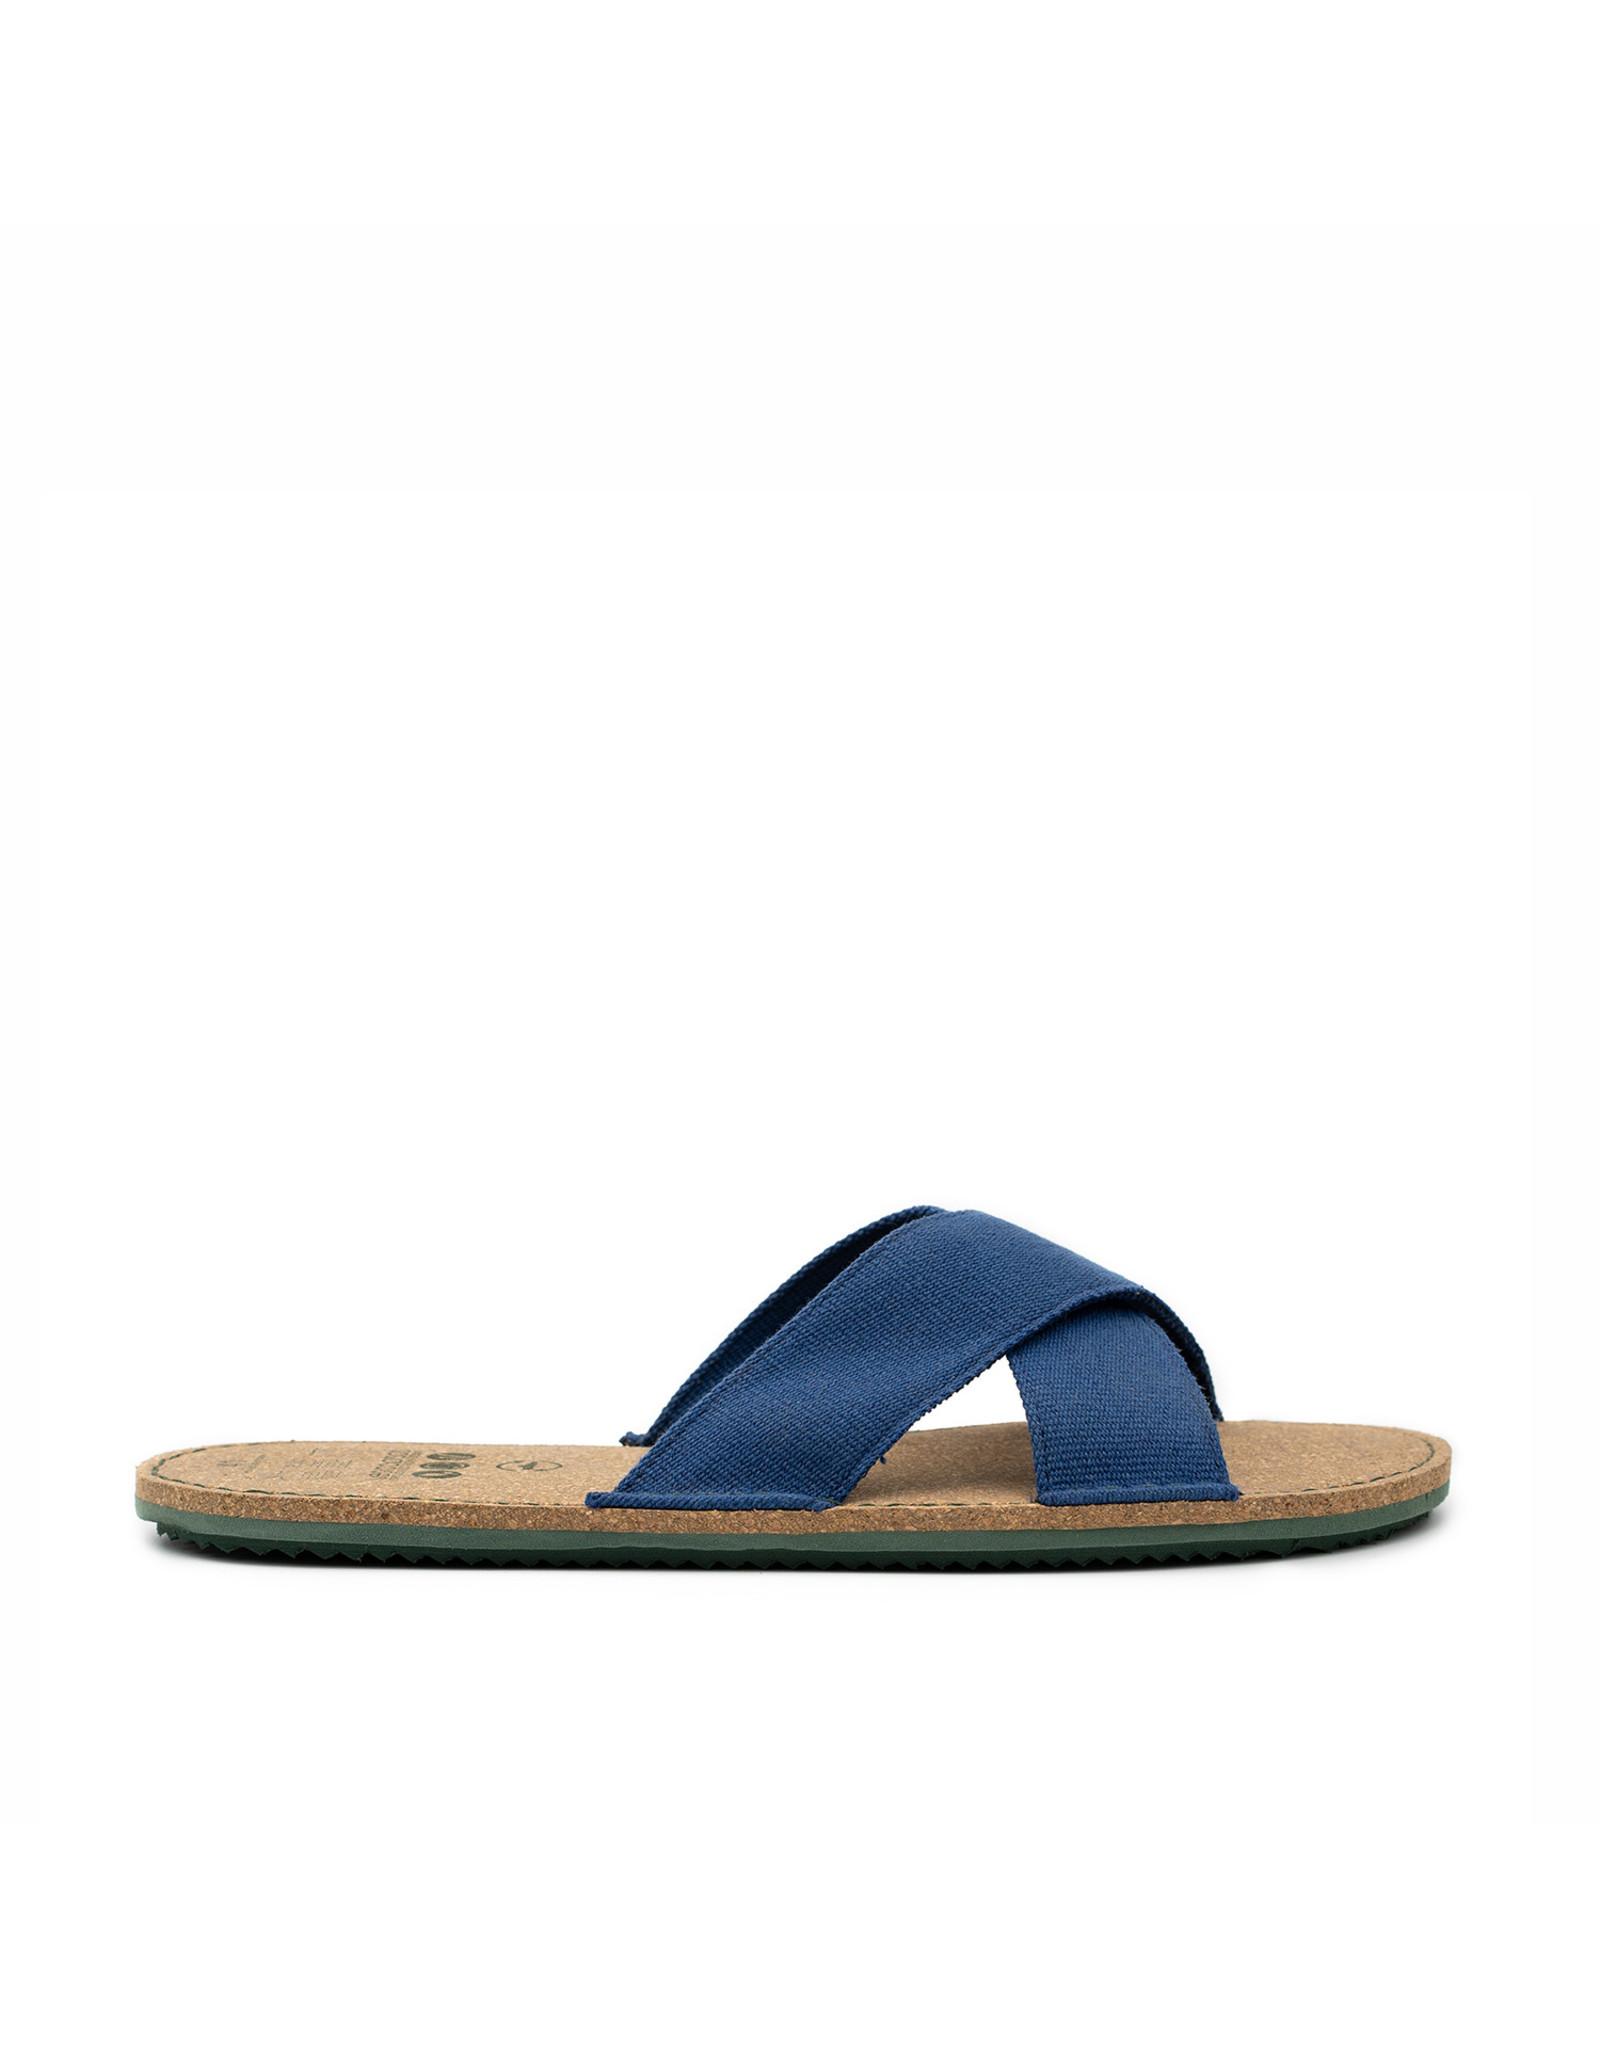 vesica piscis ALANIS crossed slides